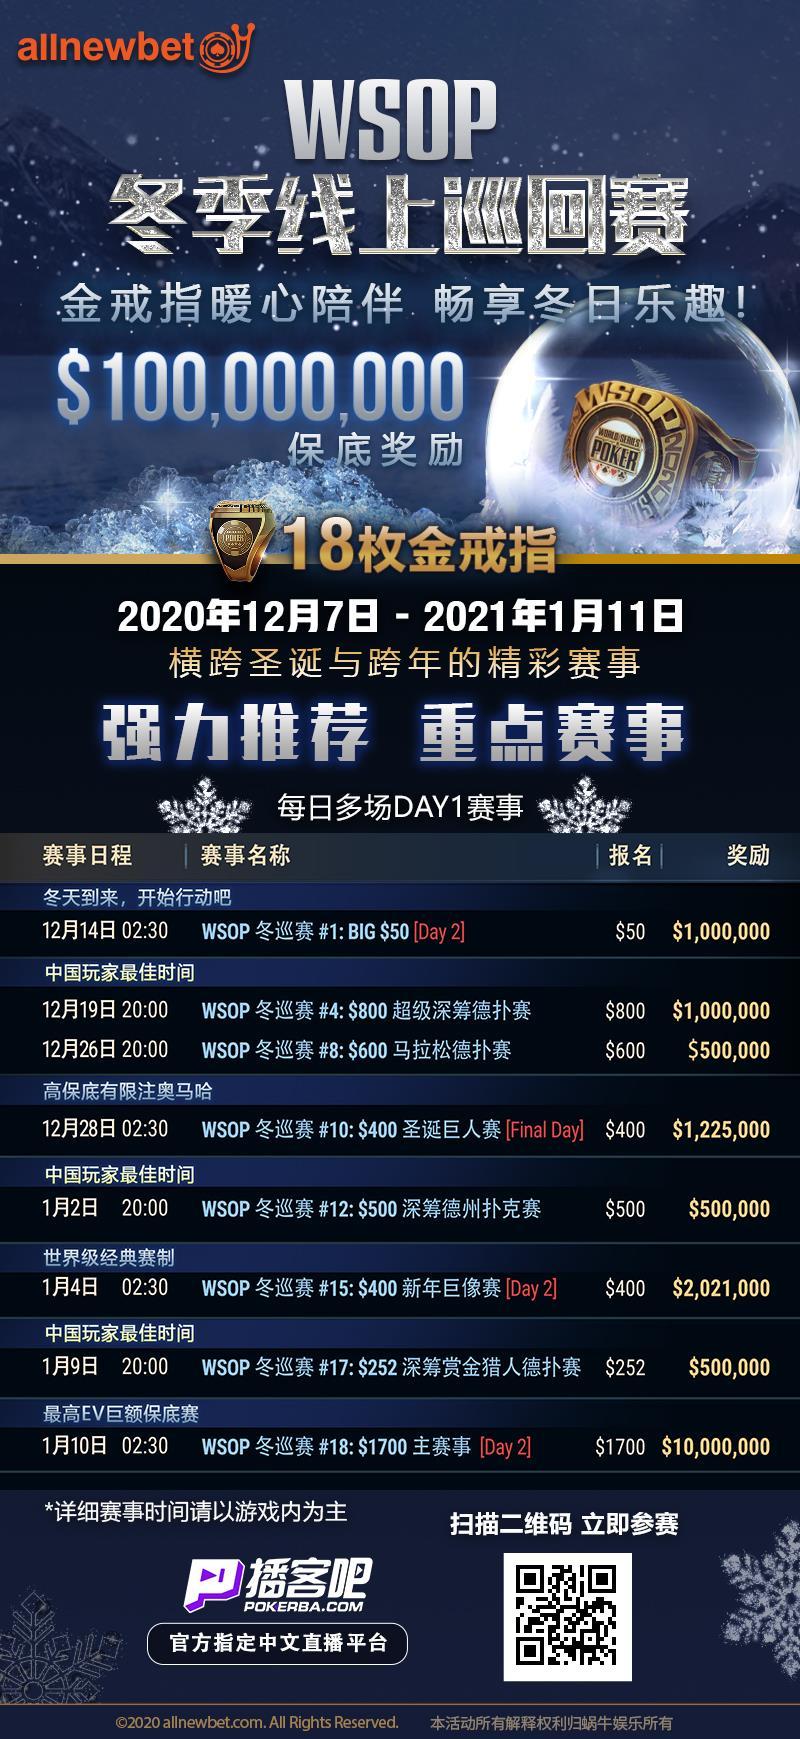 【GG扑克】WSOP冬巡赛18枚金戒指12/7开赛!携手Dan Bilzerian成为新代言人